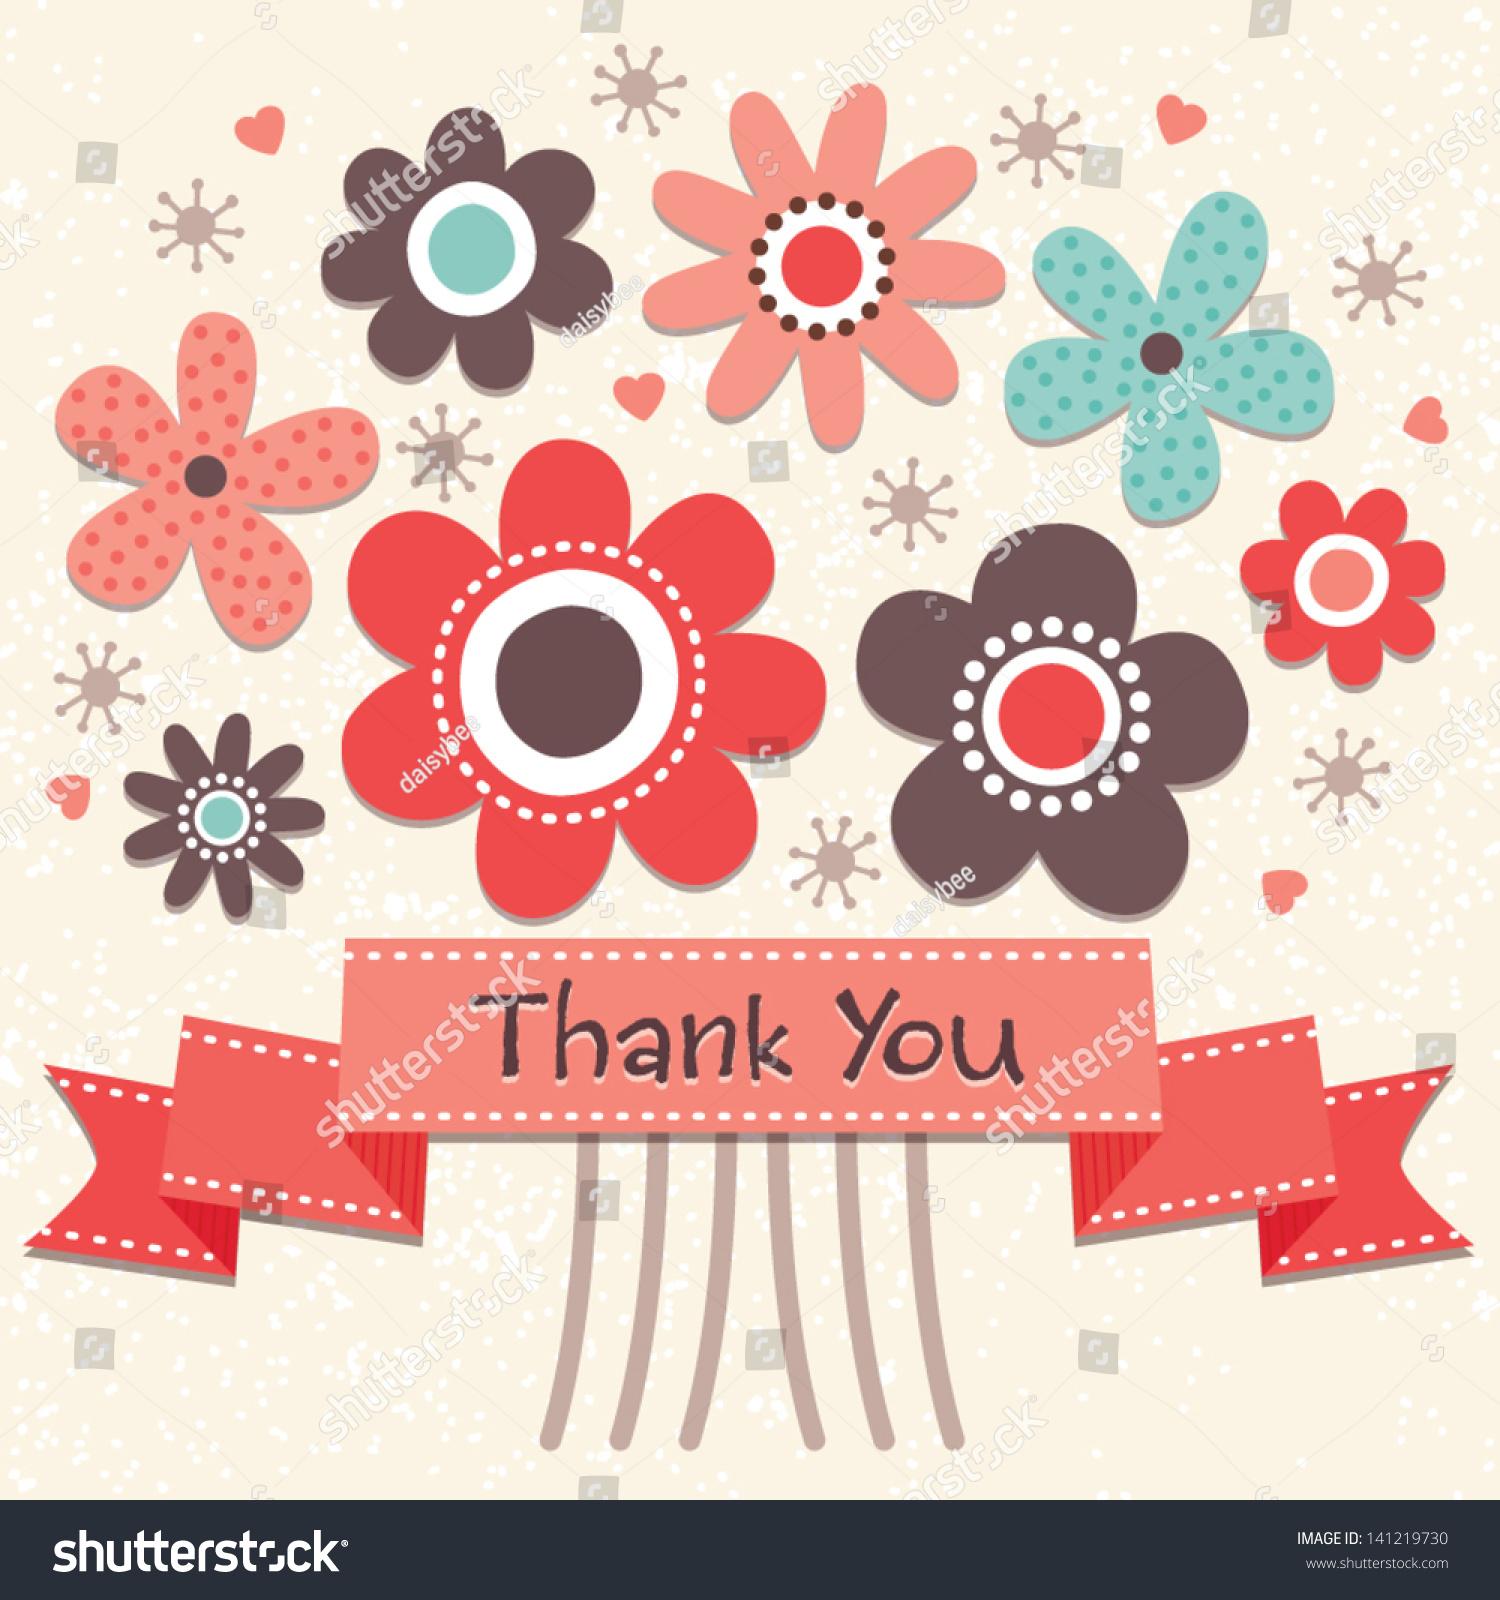 Thank You Card Vintage Ribbon Banner Stock Vector 141219730 ...